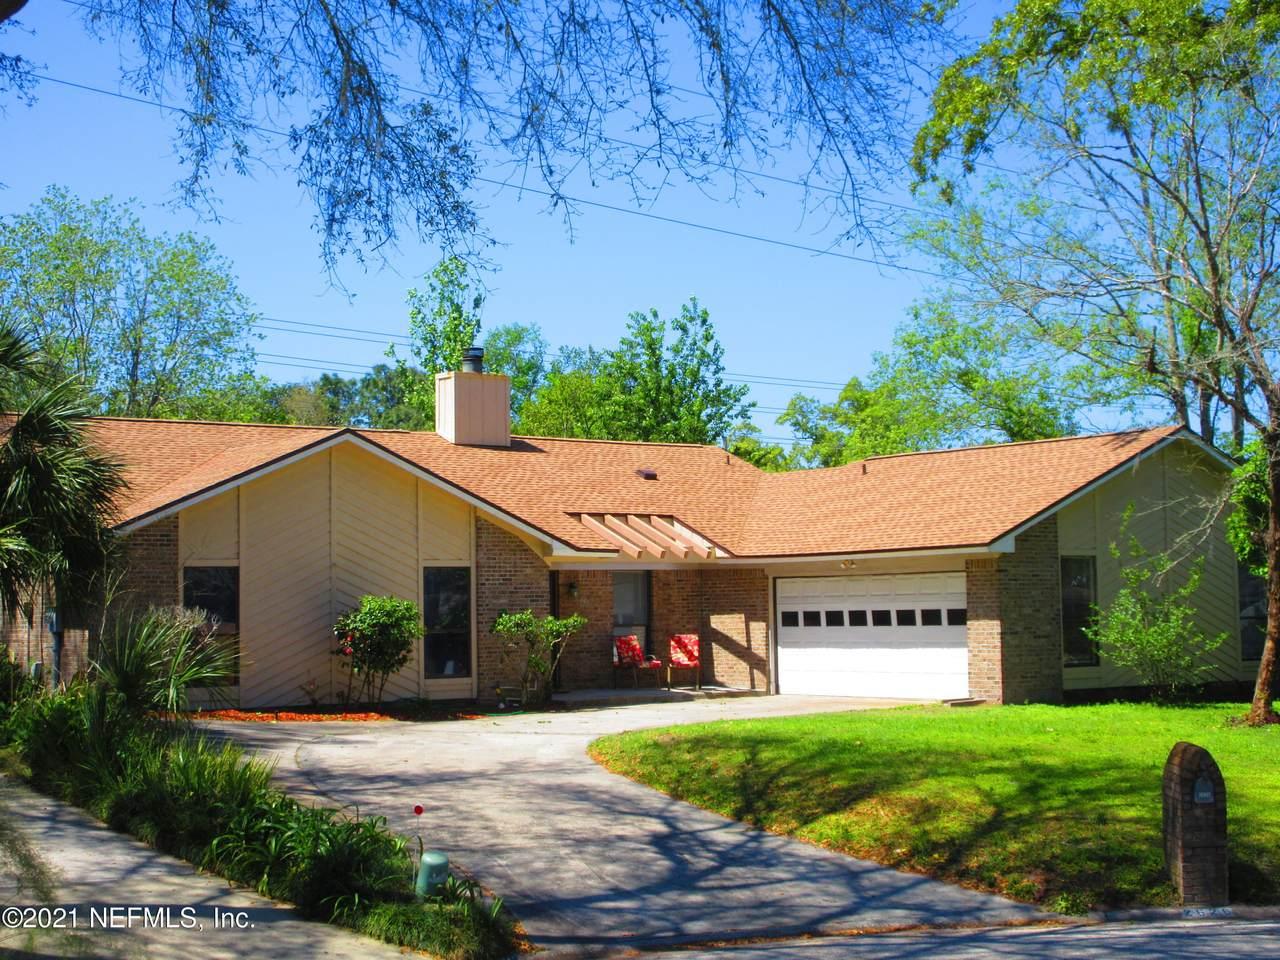 2626 Ridgecrest Ave - Photo 1